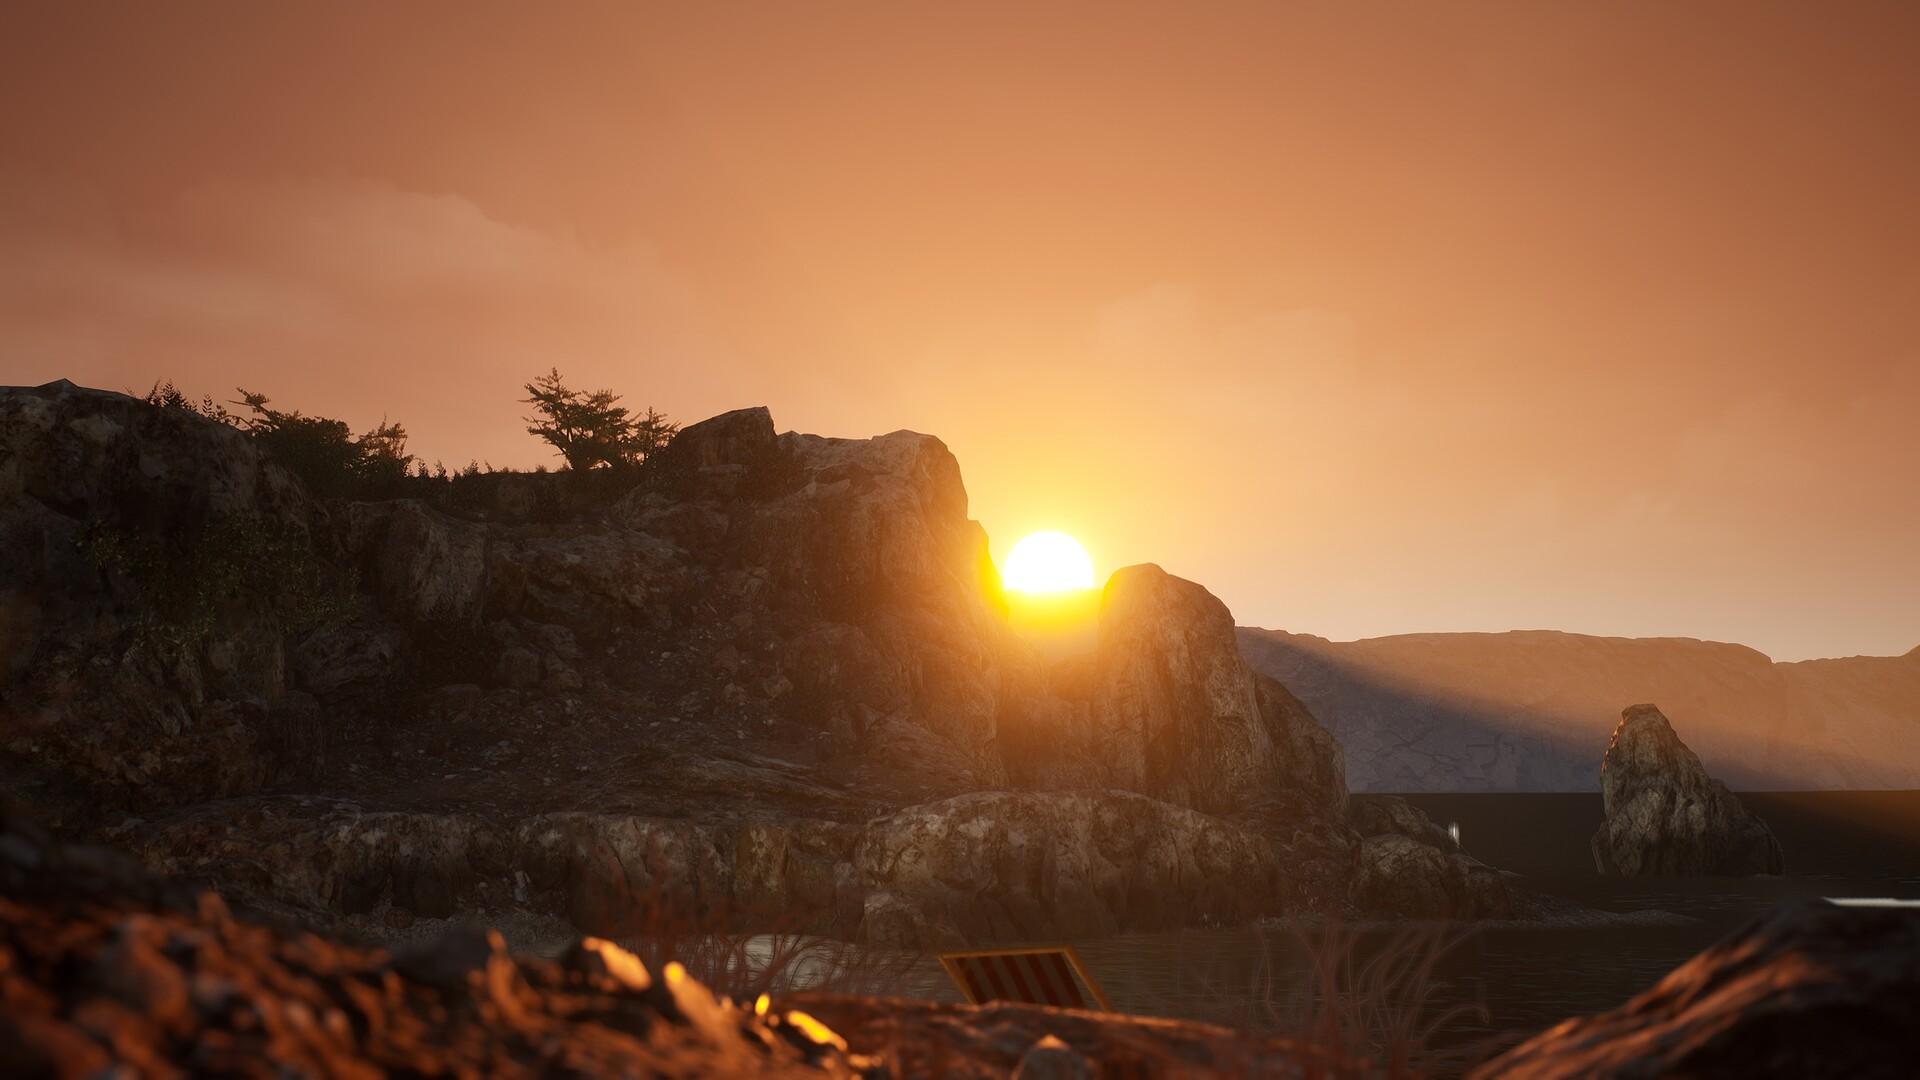 sunset in island ue4 lighting practise